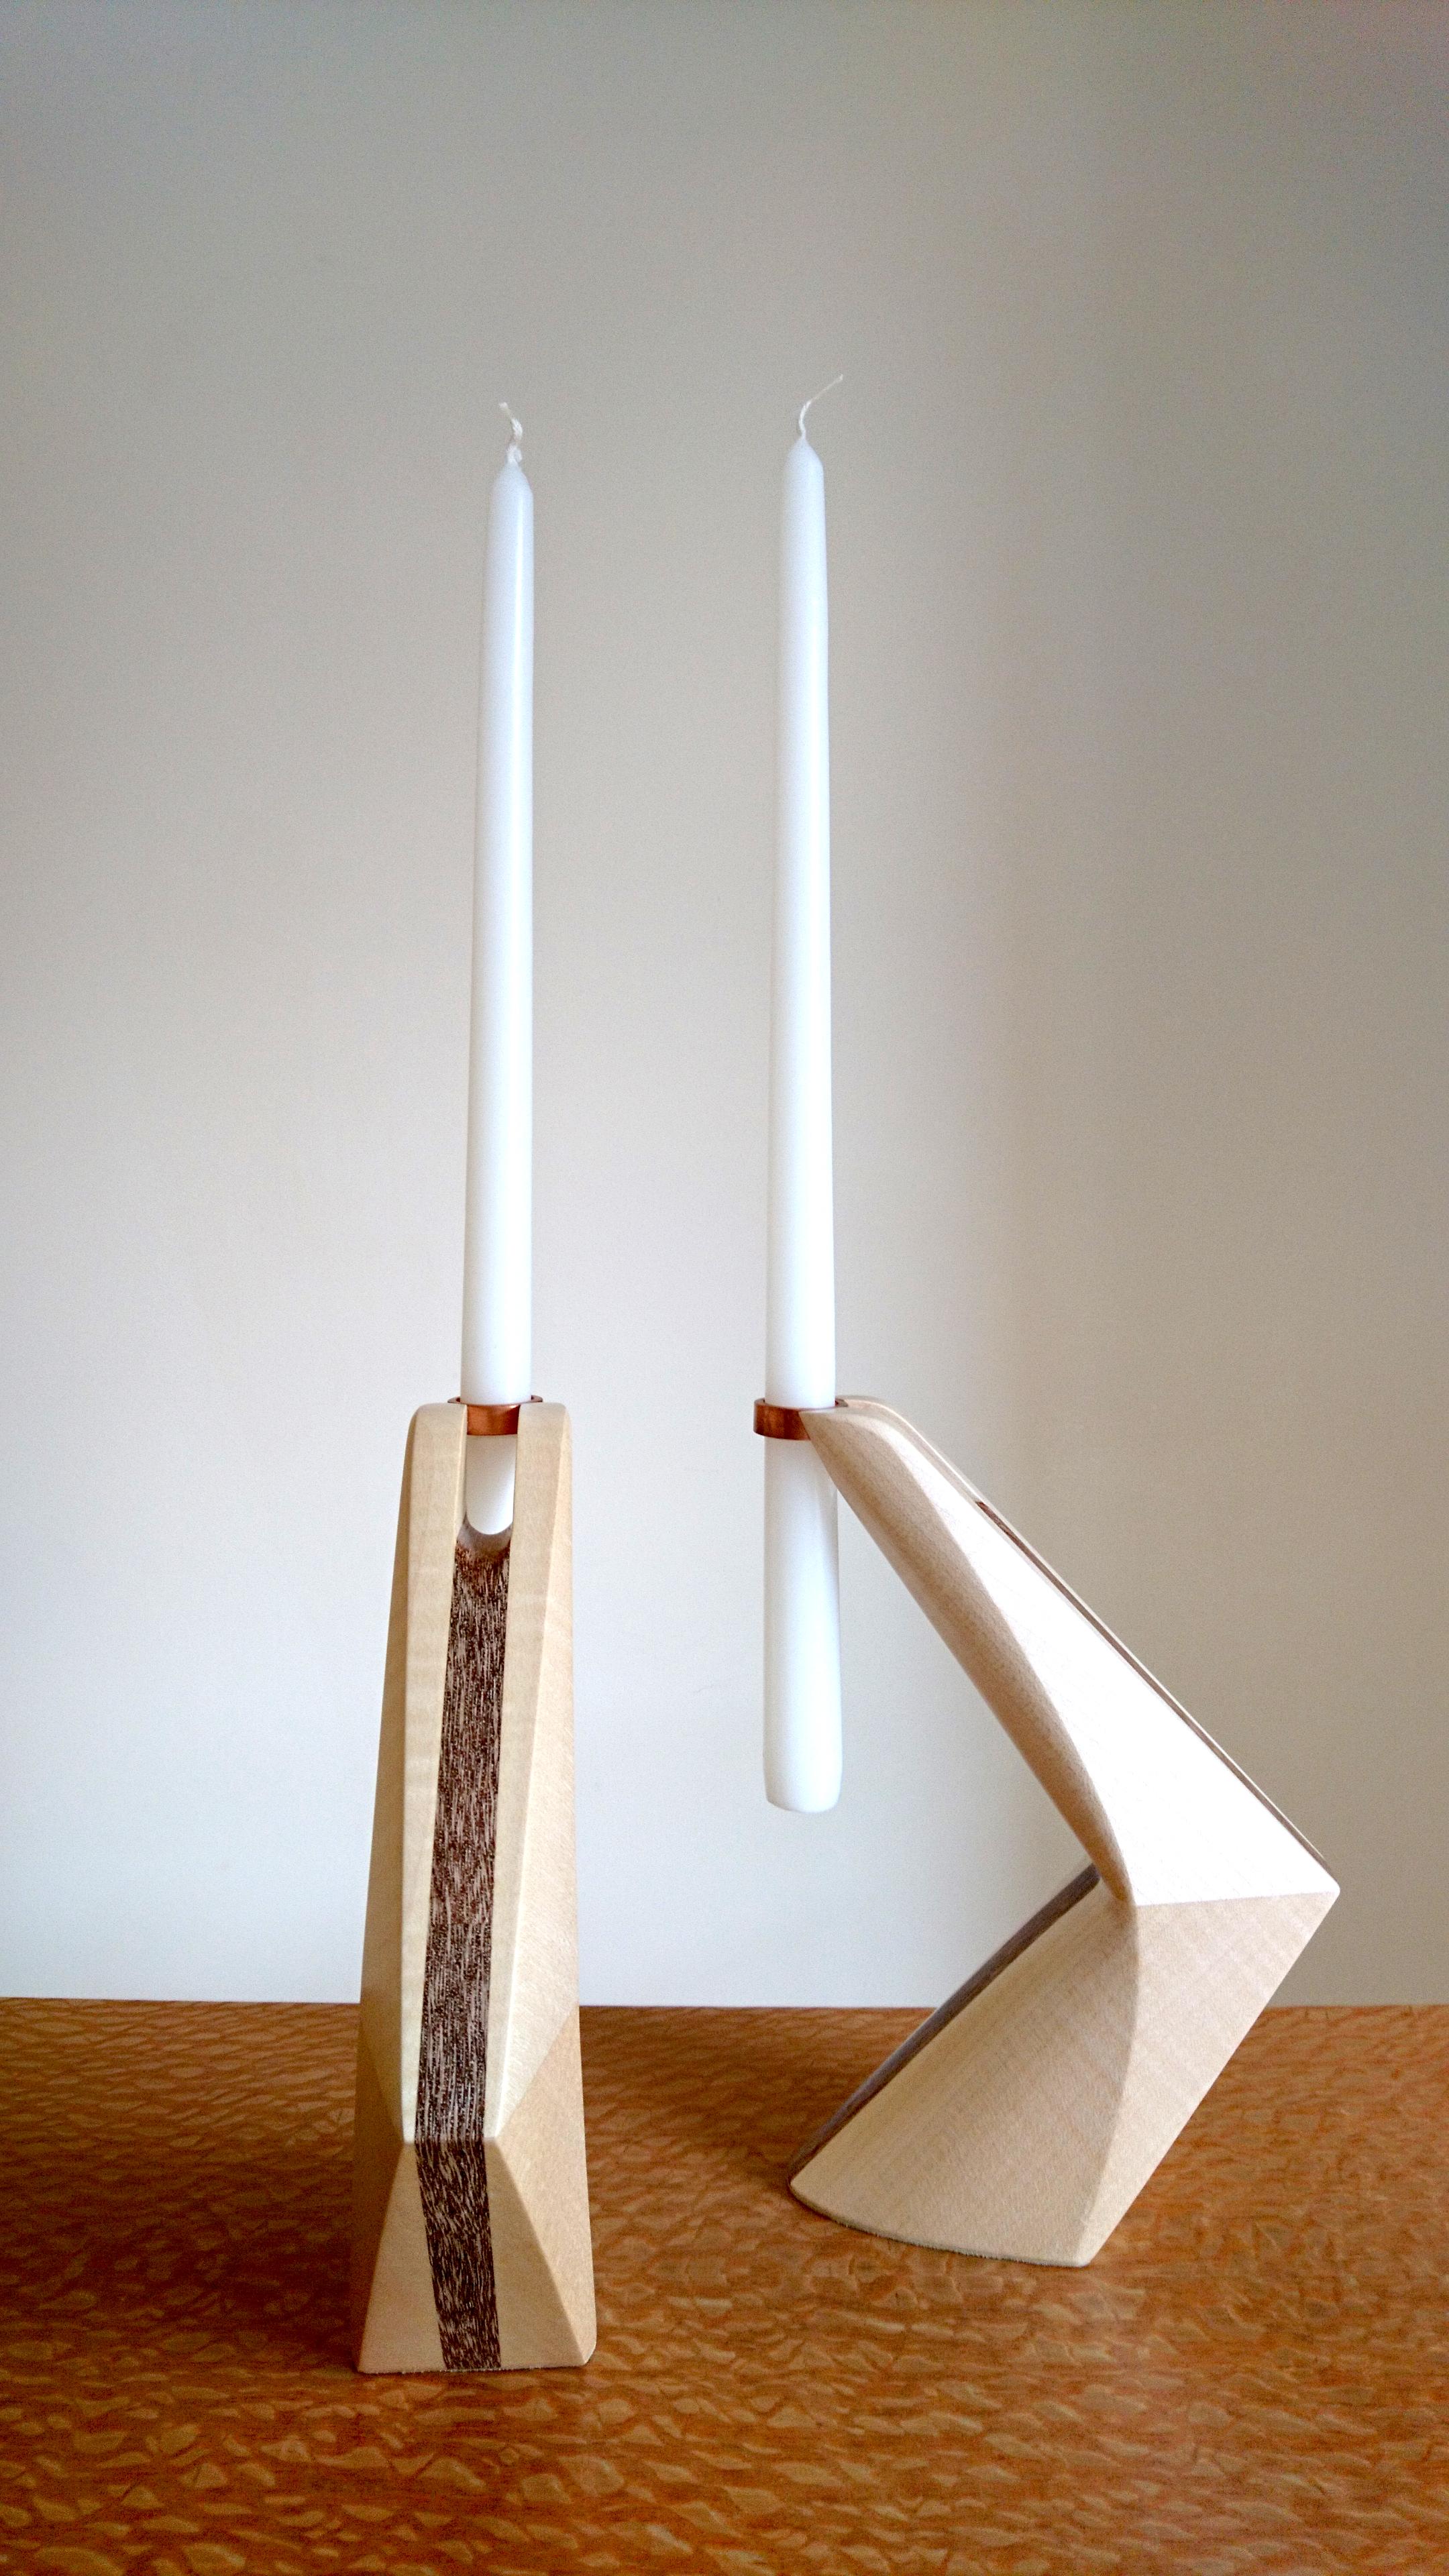 Candlesticks 4.jpg